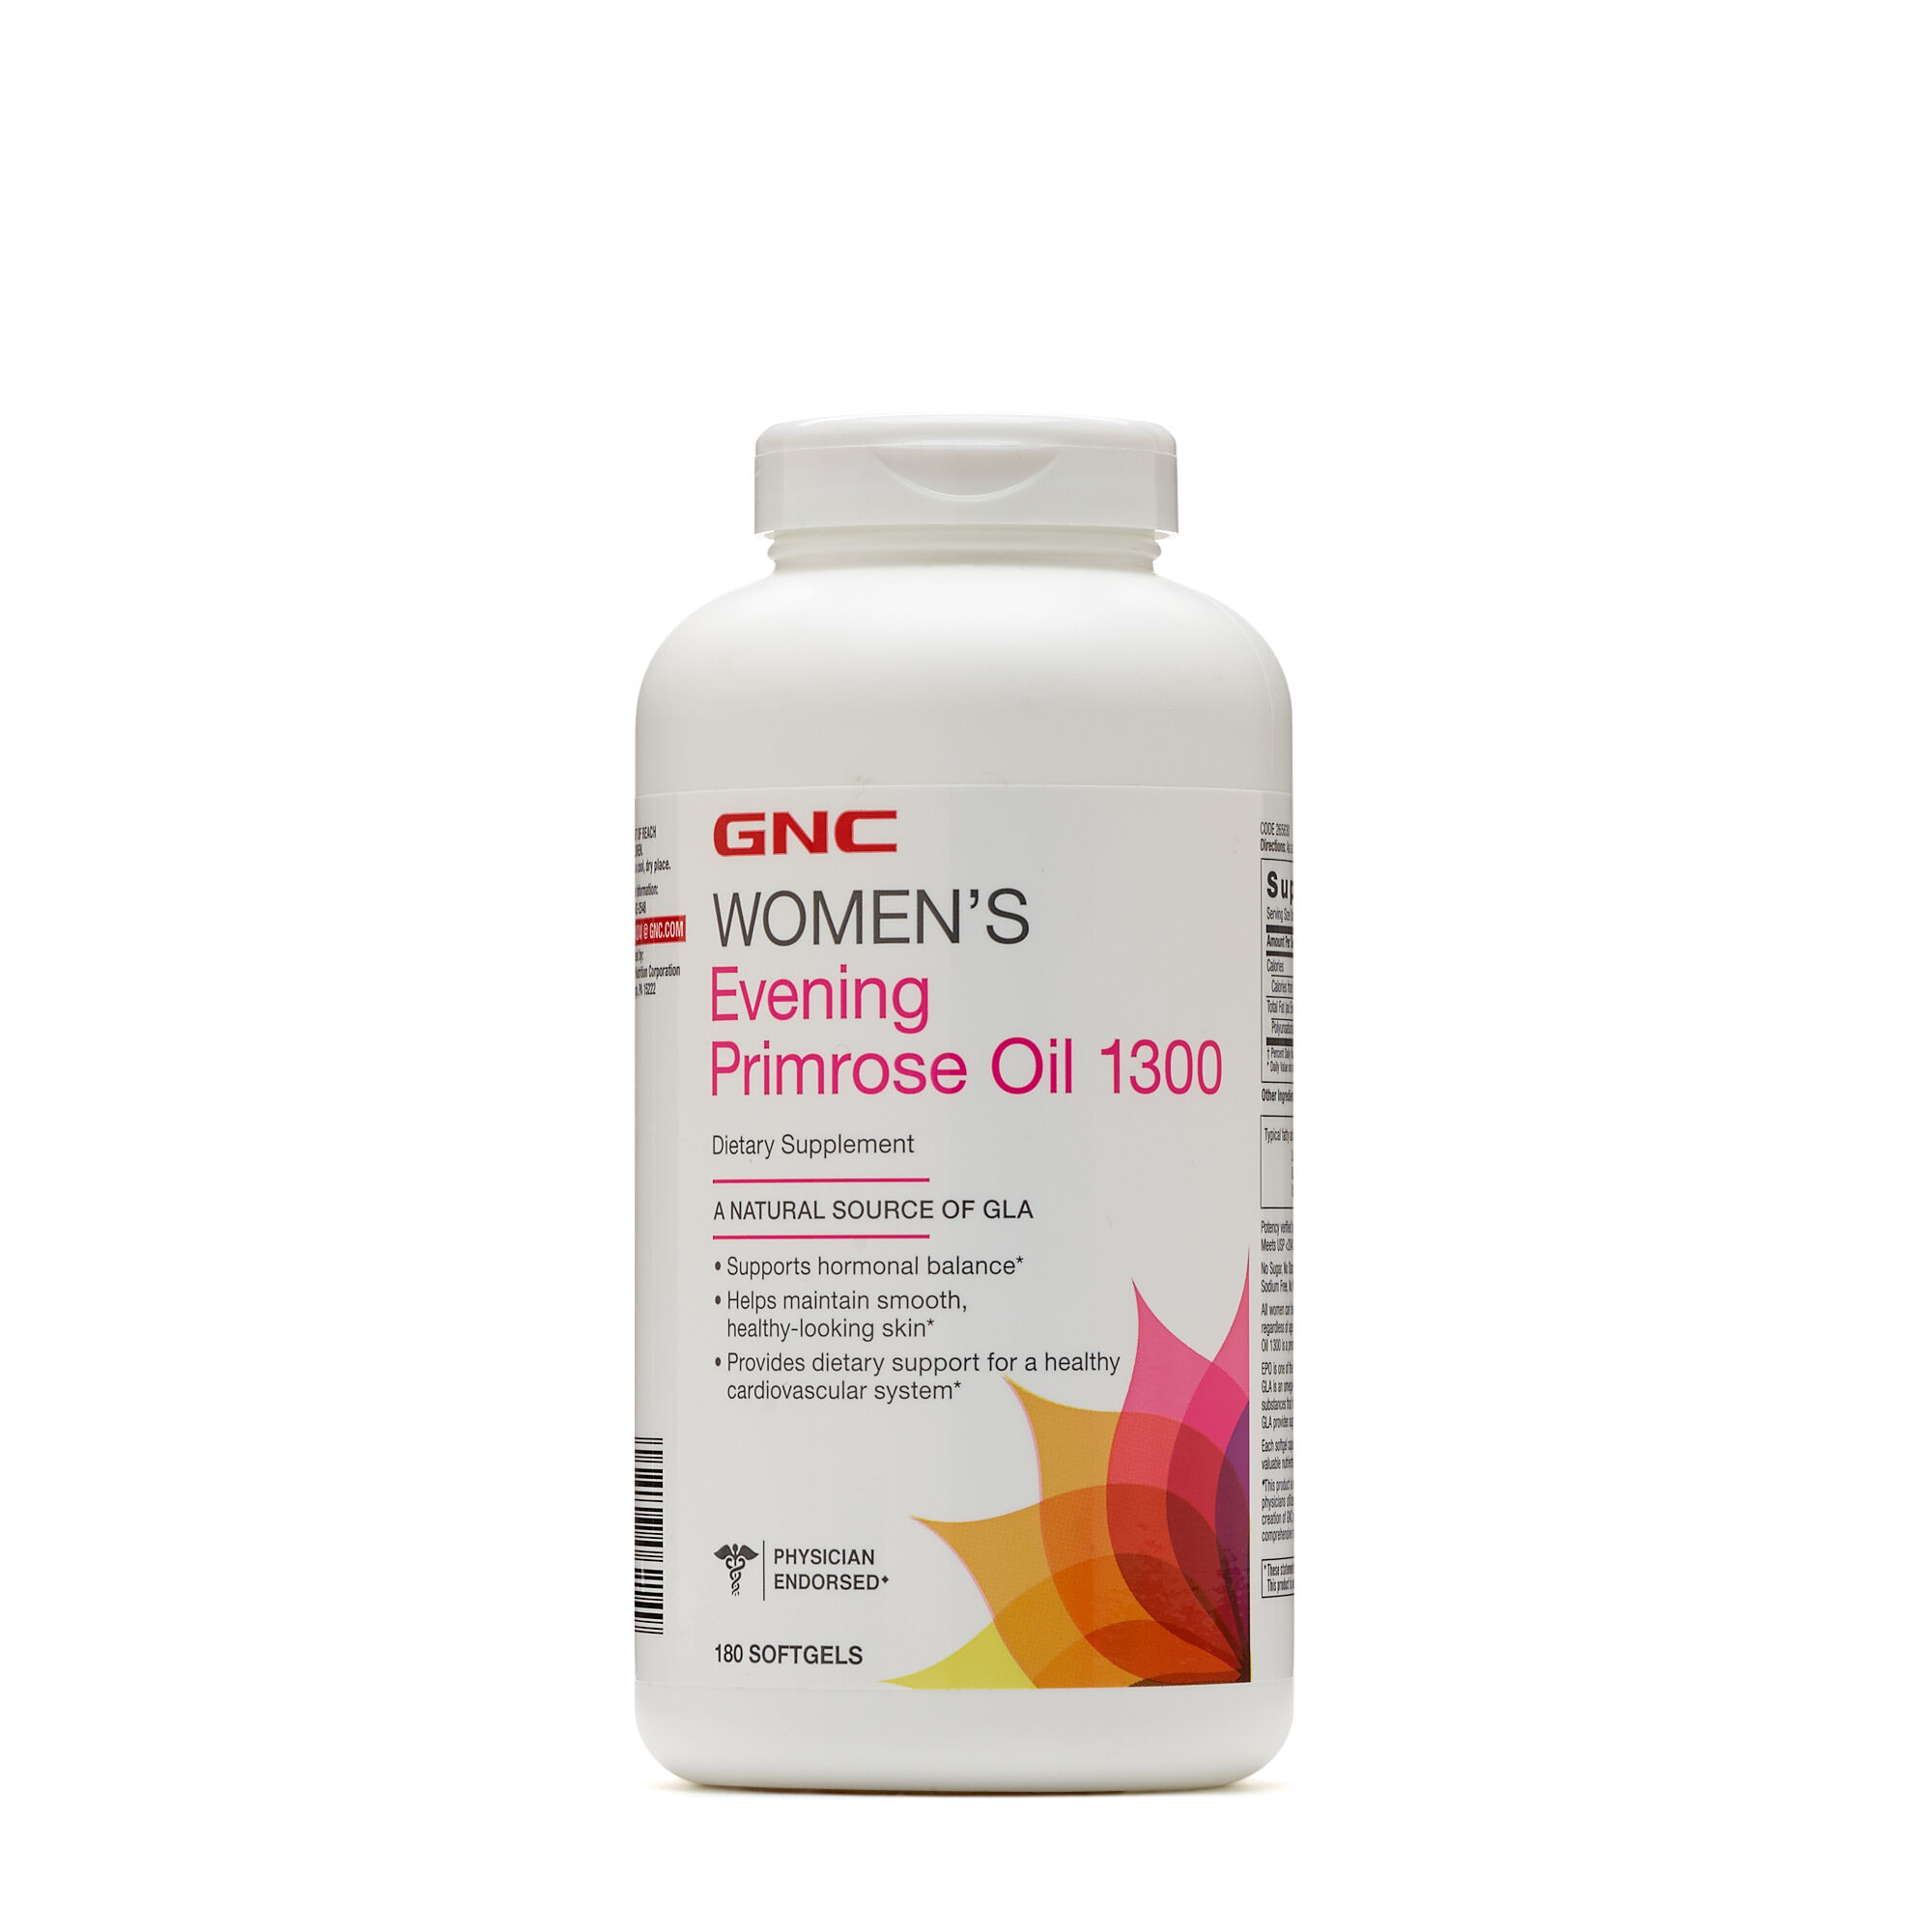 Evening primrose oil benefits sex